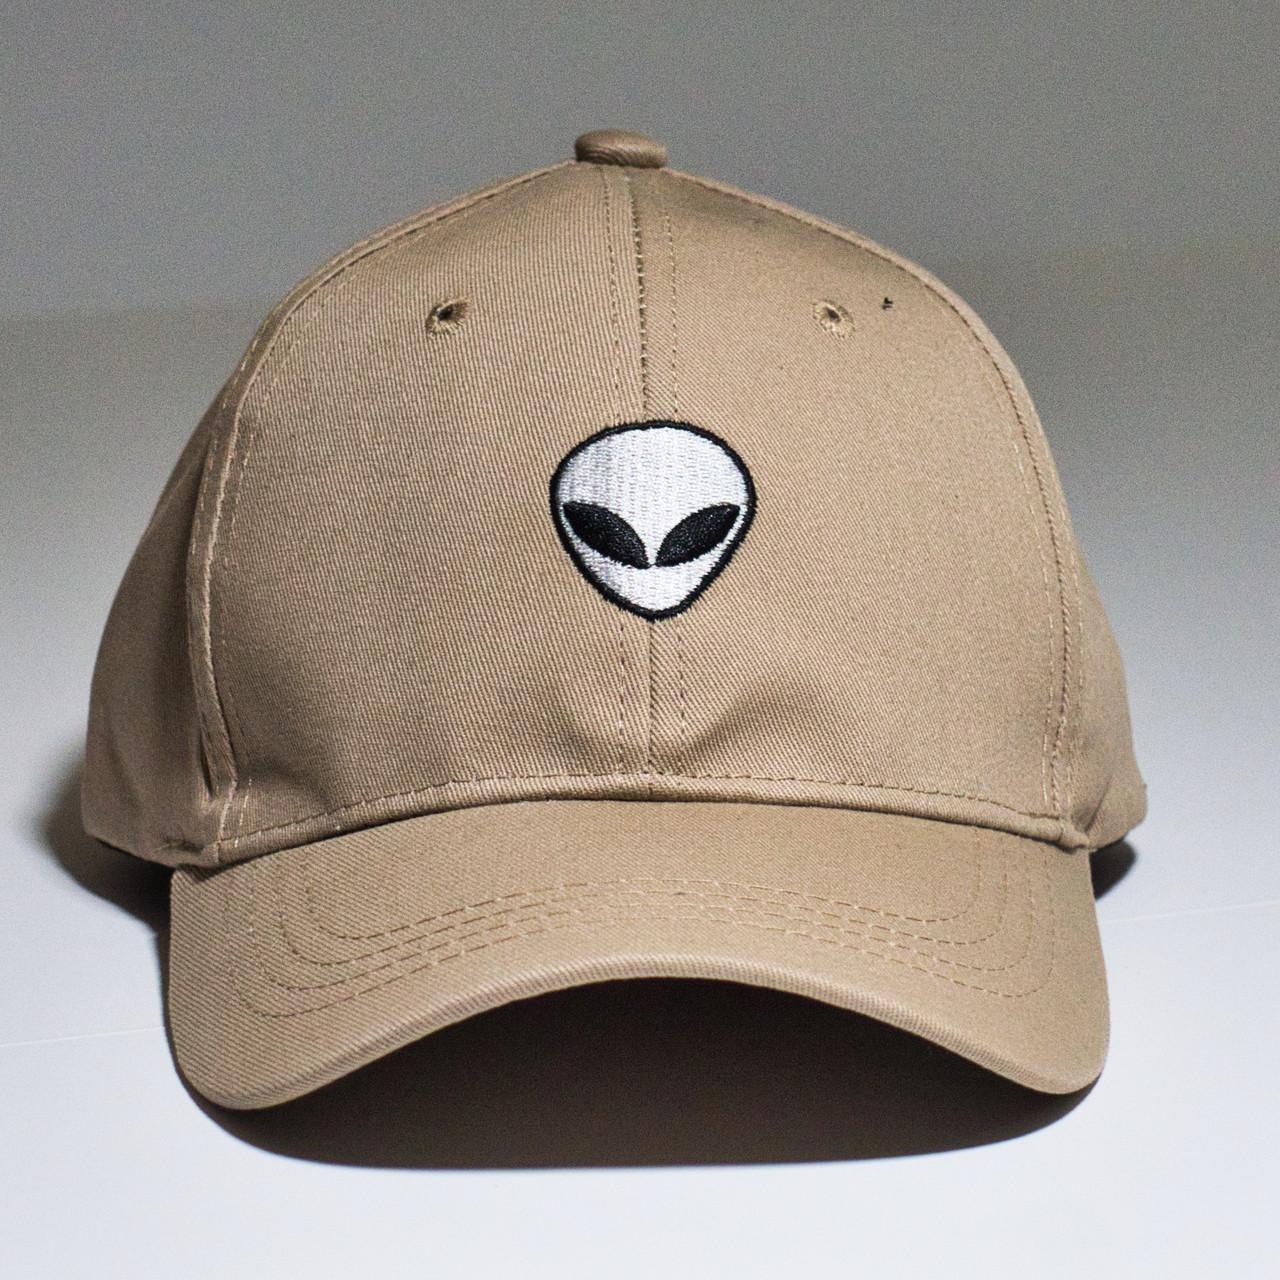 b3d93f248ca Alien Baseball Cap - Khaki - The UFO Congress Store